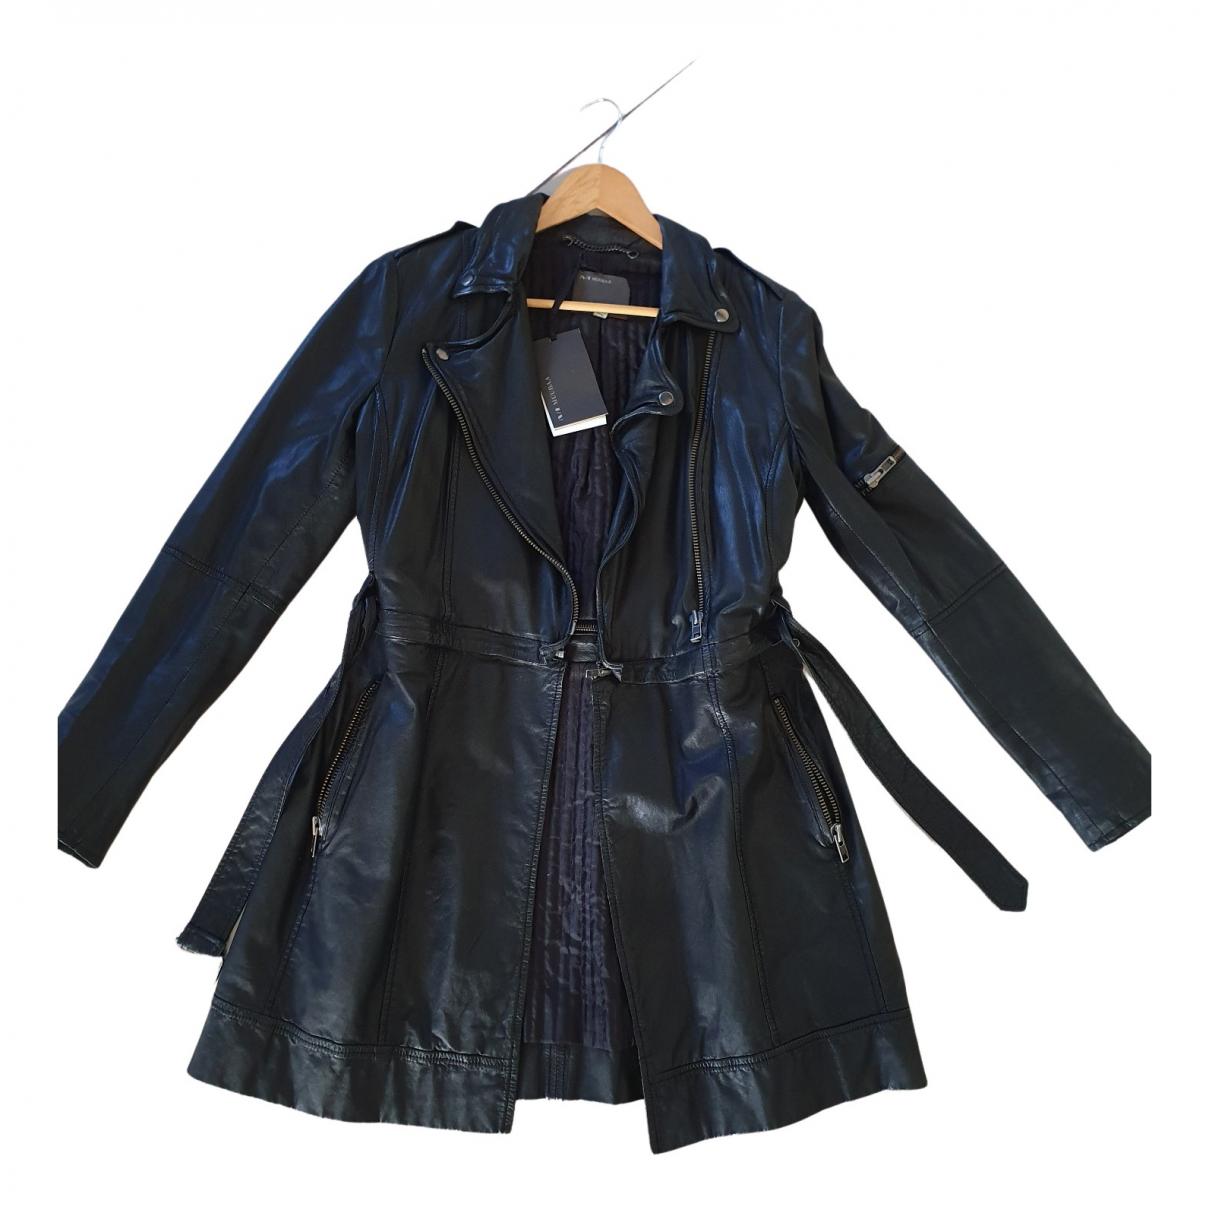 Muubaa N Black Leather Leather jacket for Women 12 UK